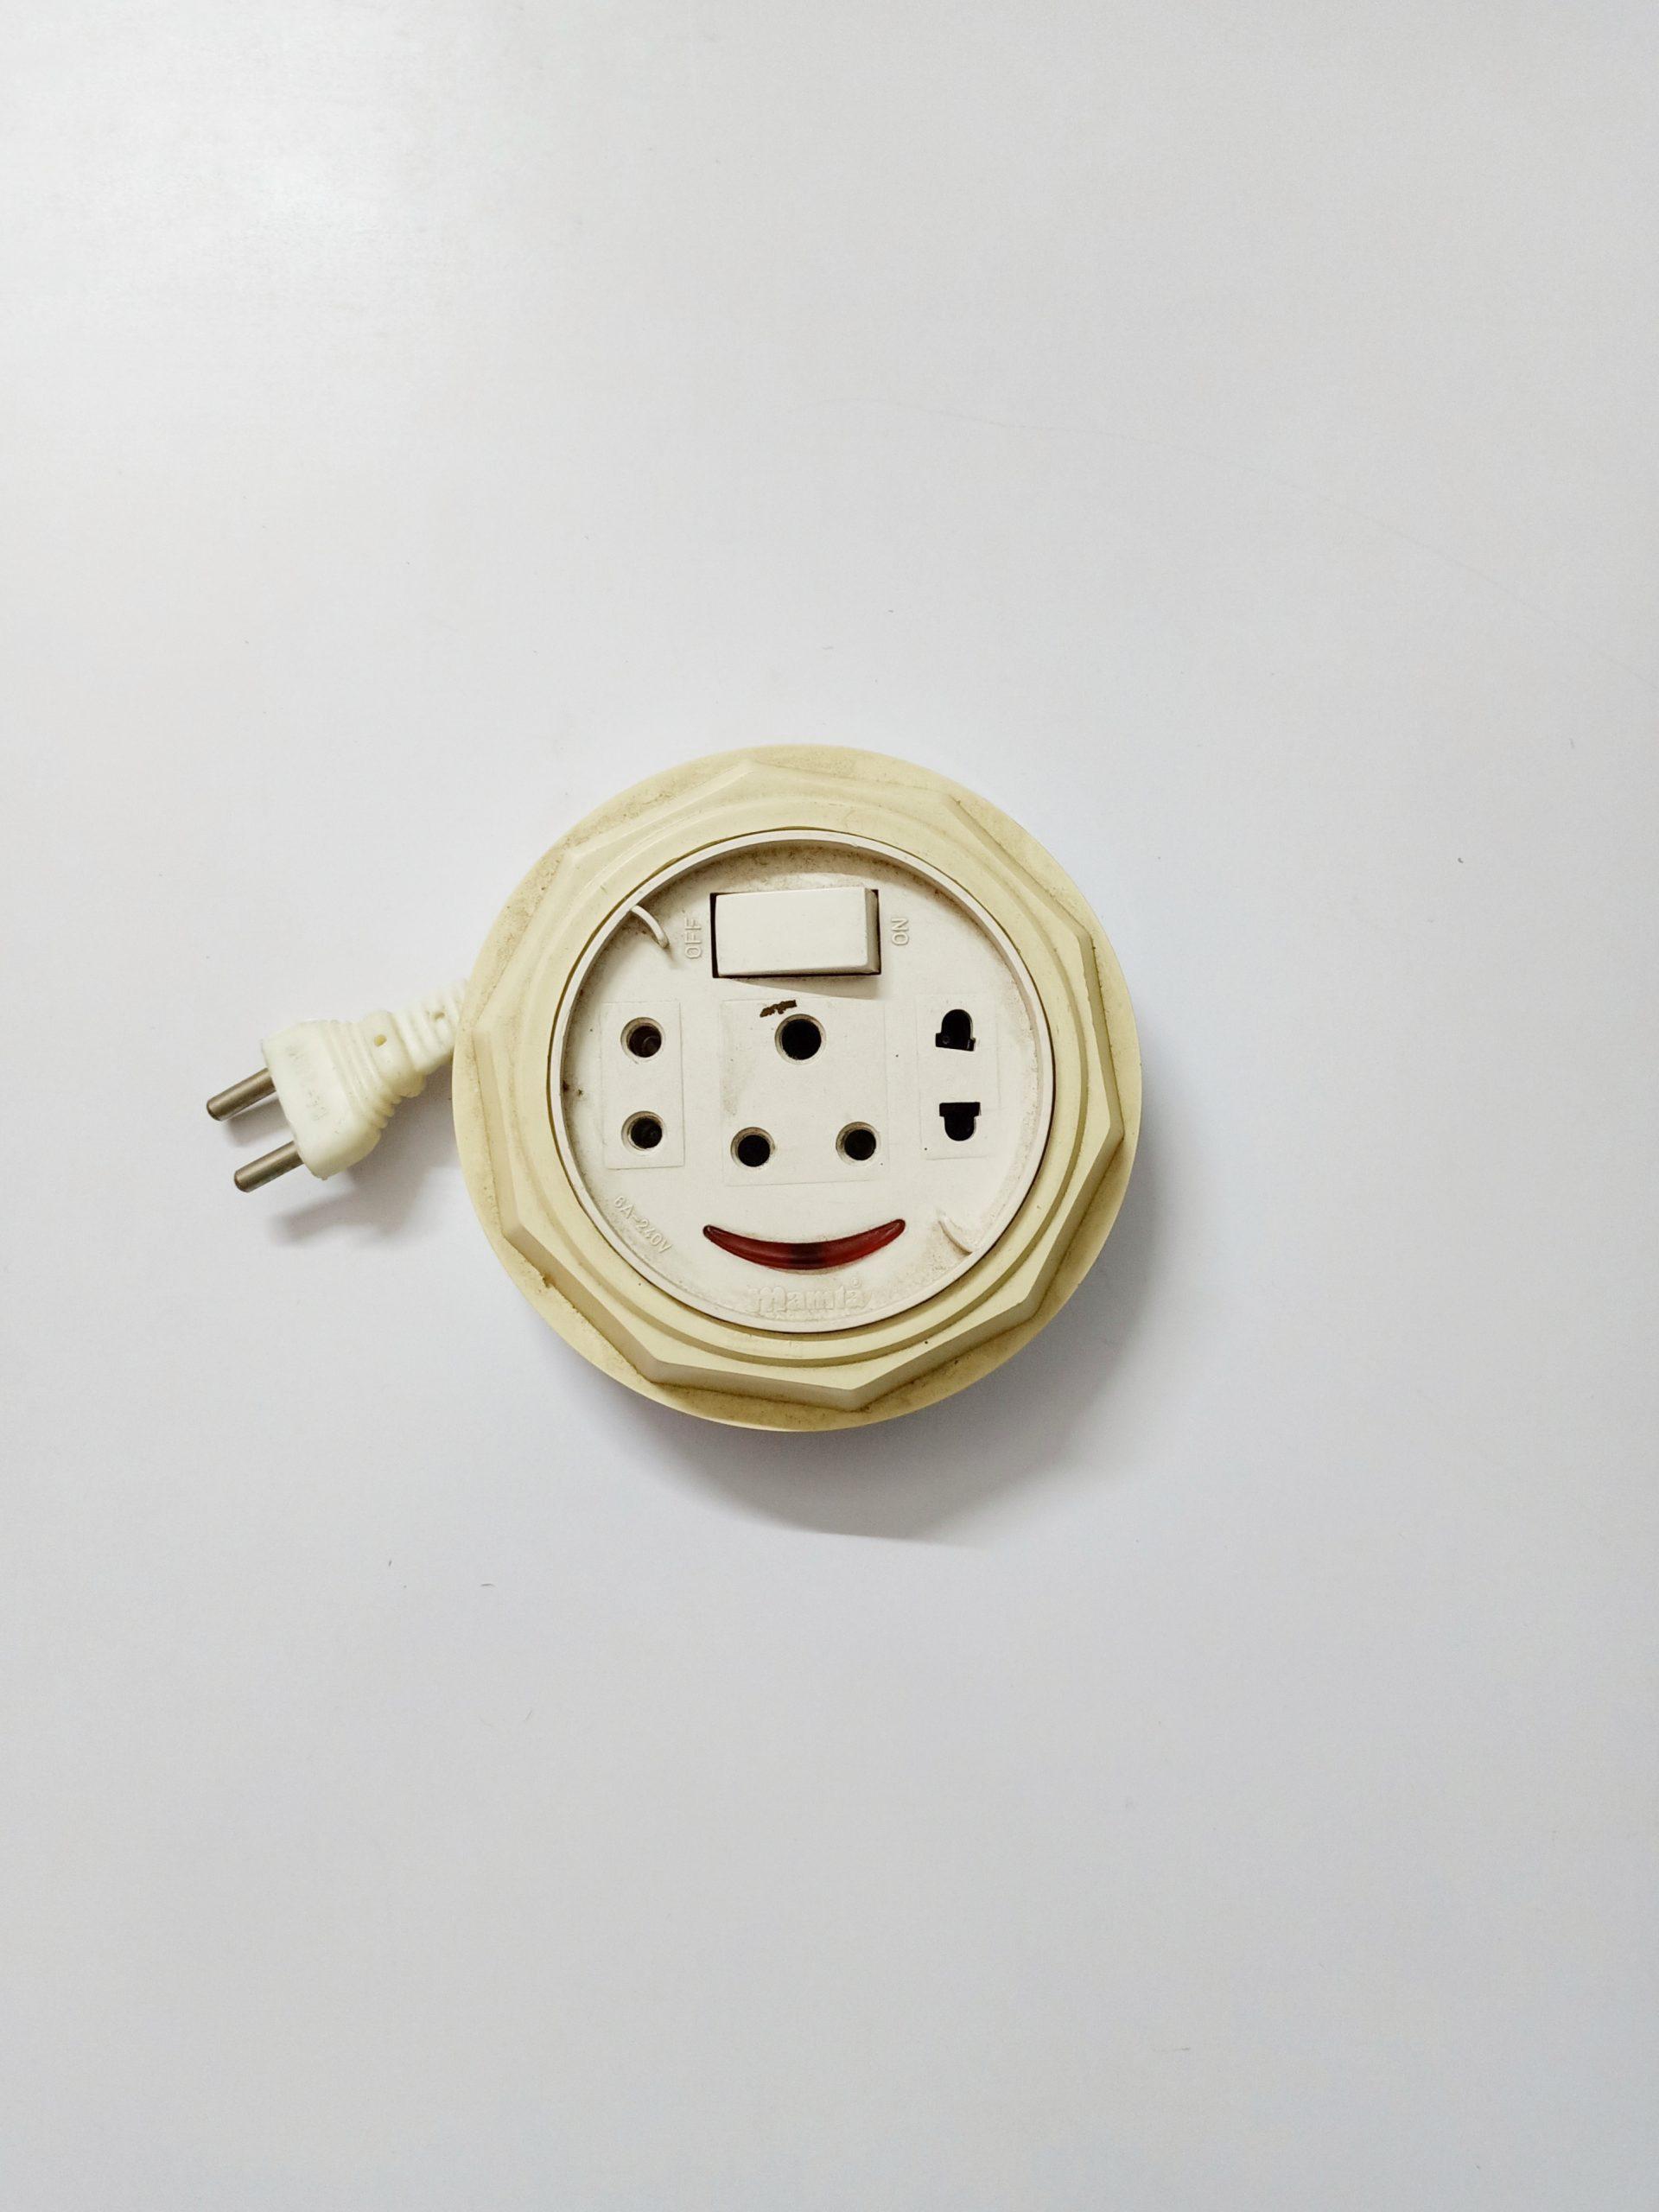 A extension board plug